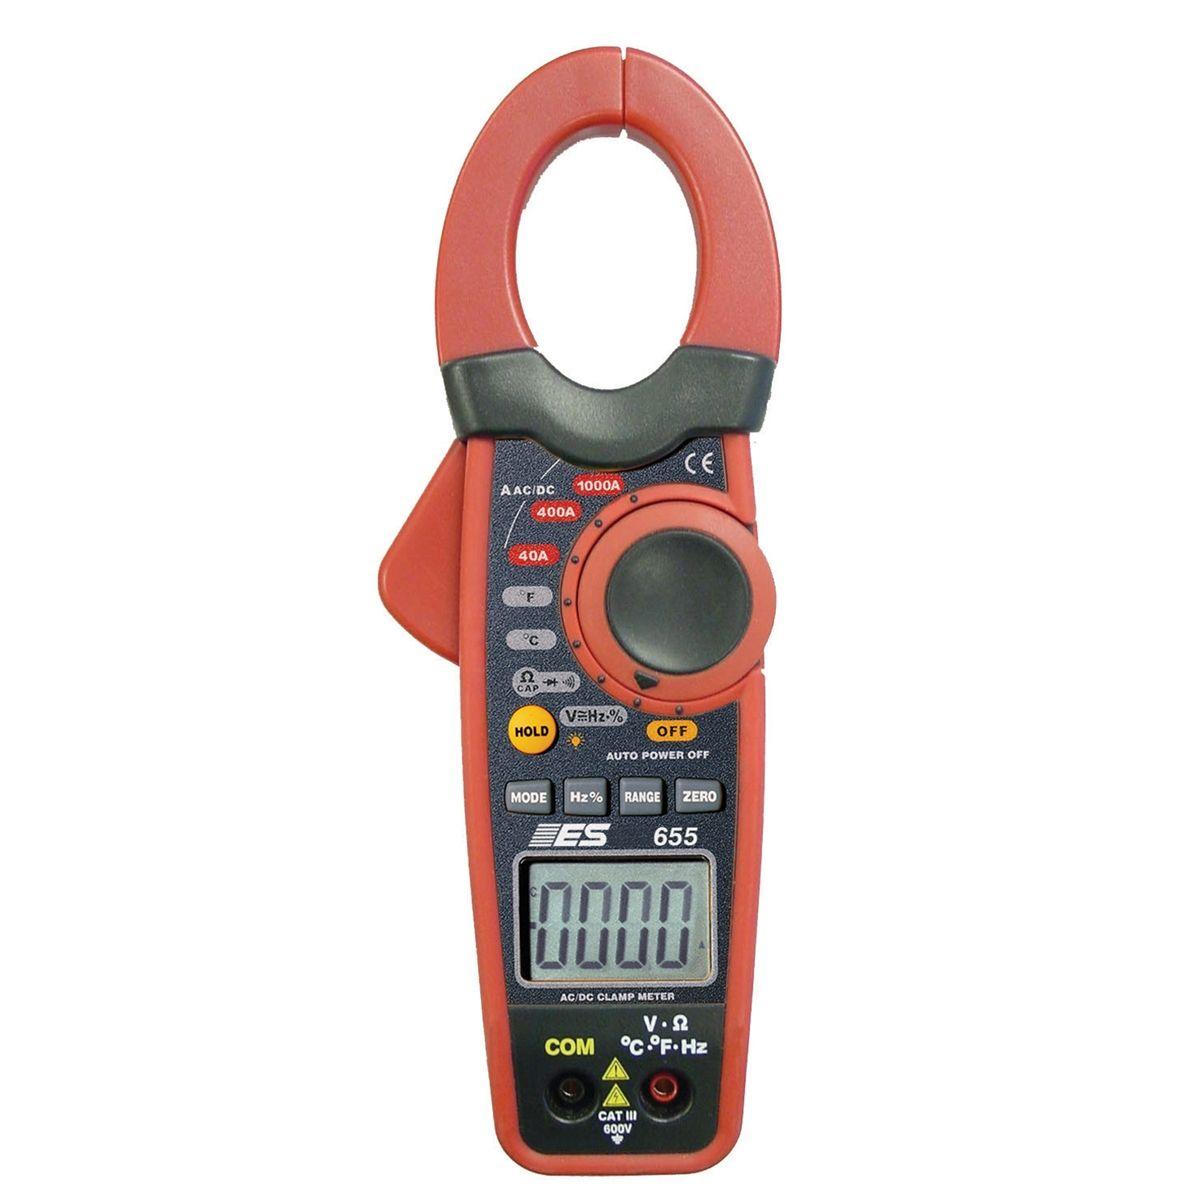 Induction Amp Meter Pick Up : Amp current probe digital multimeter esi